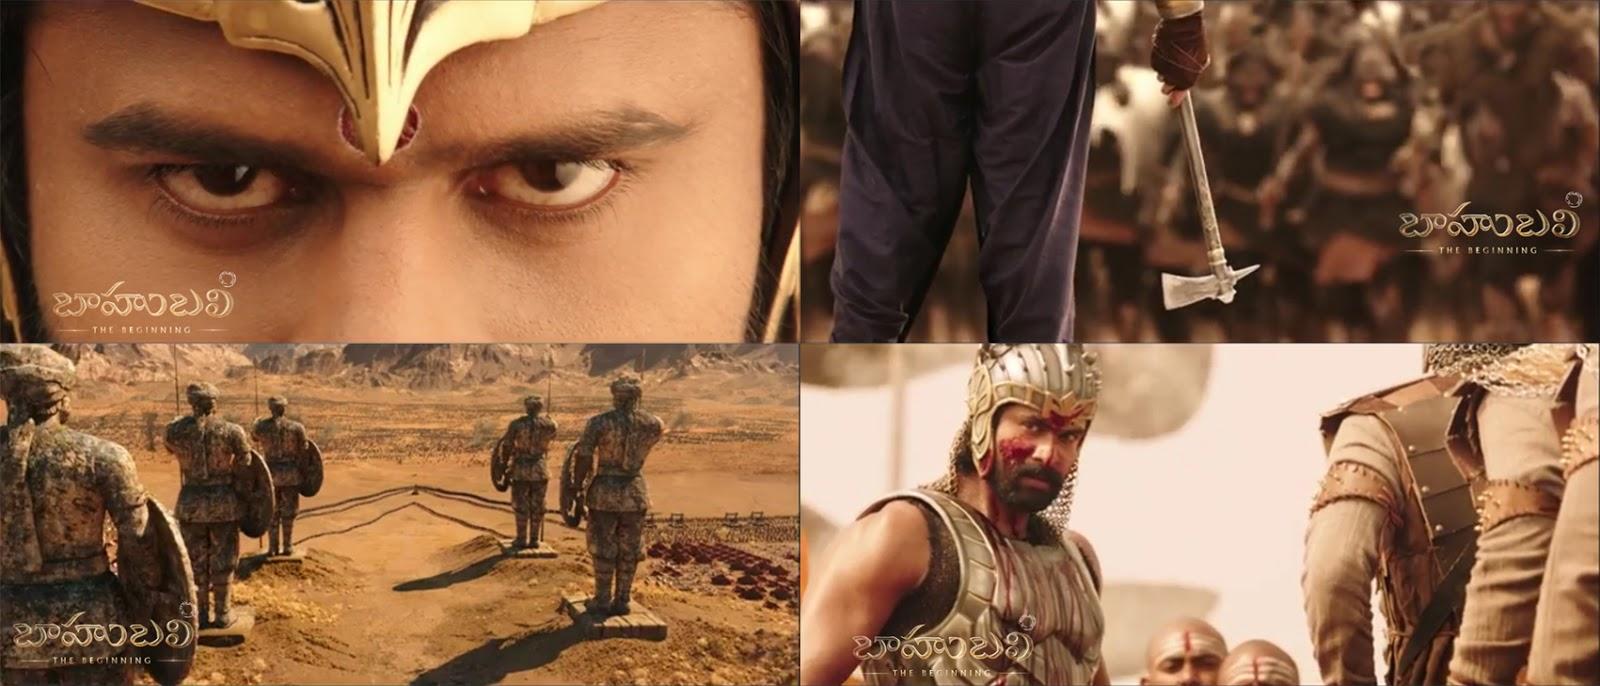 Baahubali - The Beginning Teaser - Prabhas, Rana Daggubati,Anushka, rajamouli